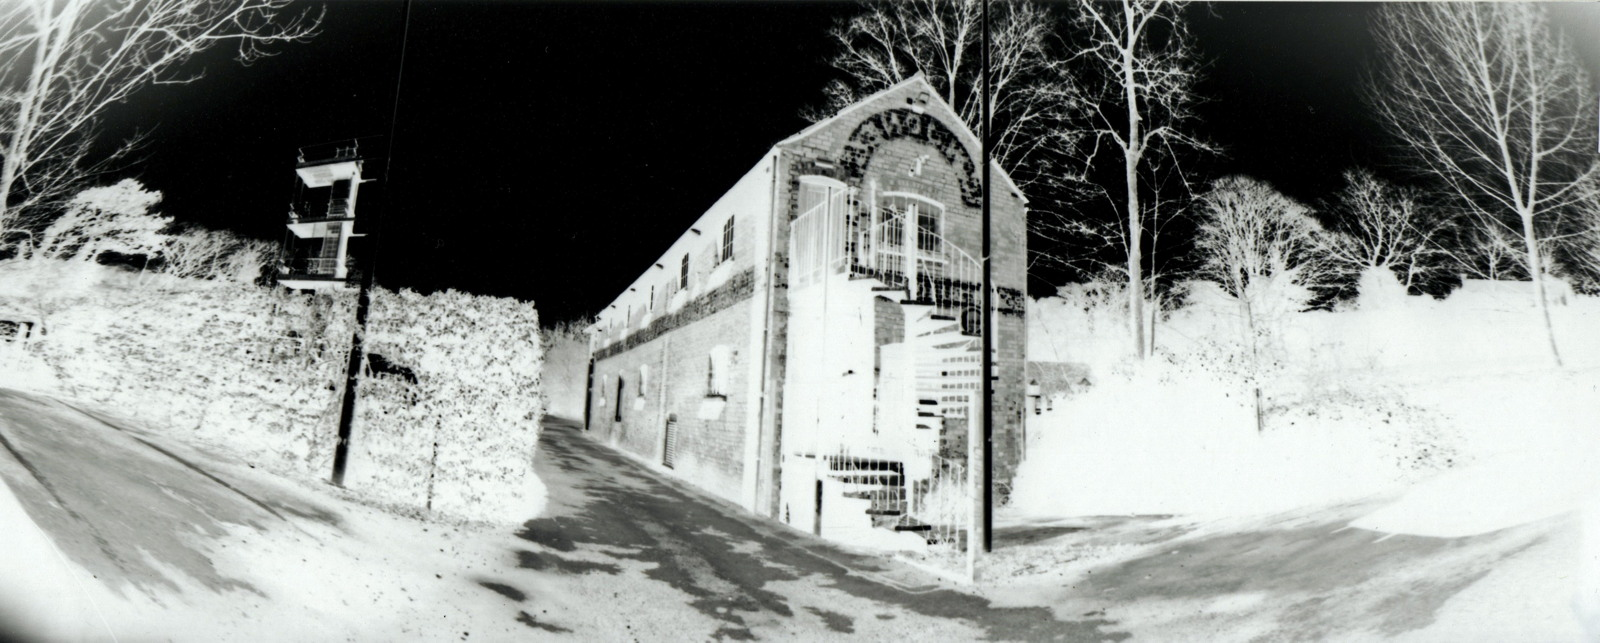 4. Jones Building, Egypt Mill